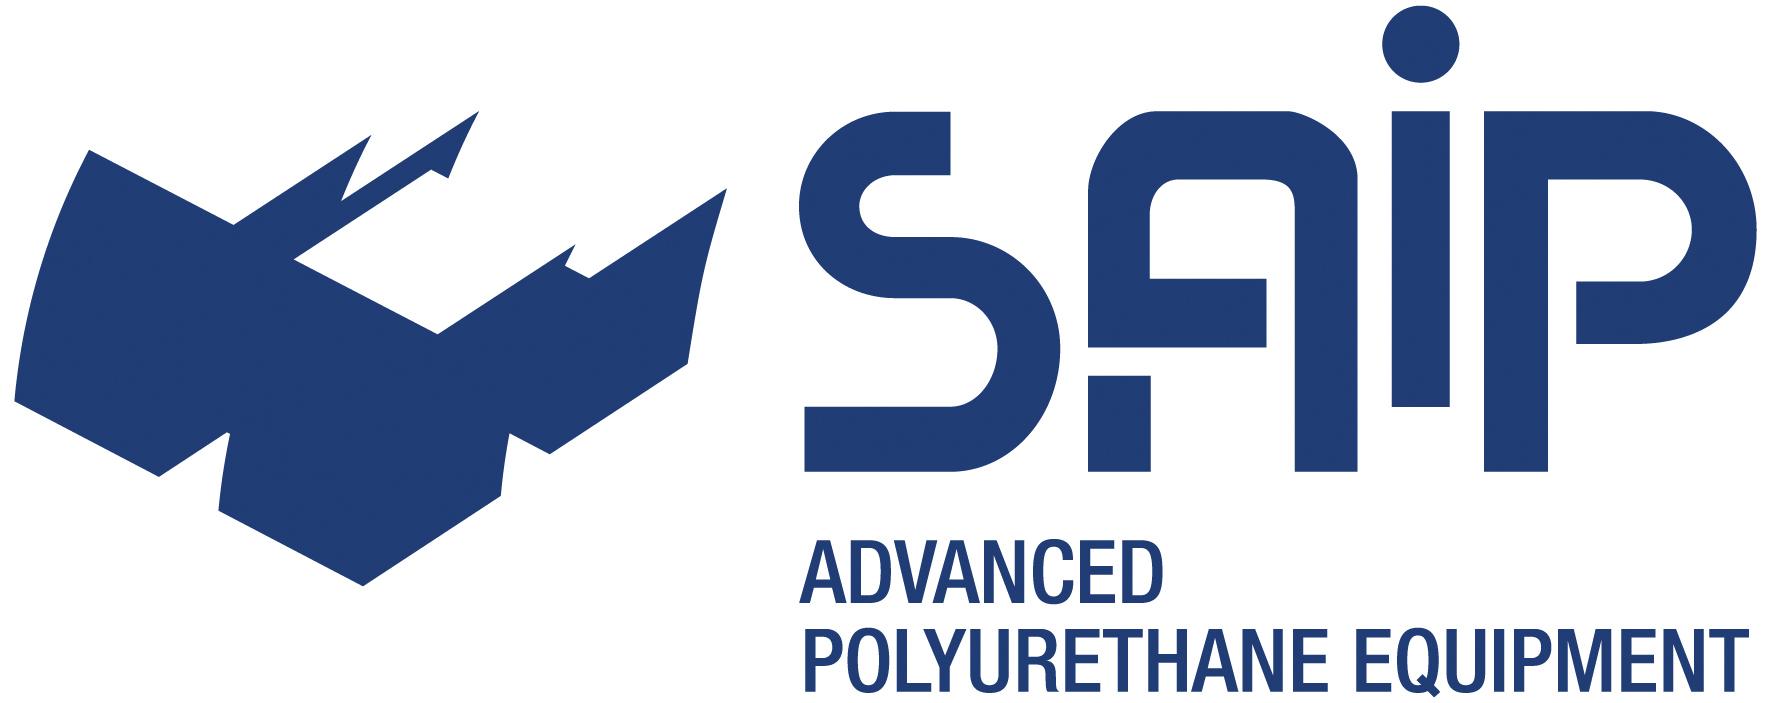 SAIP EQUIPMENT    Pozzi Industries Group